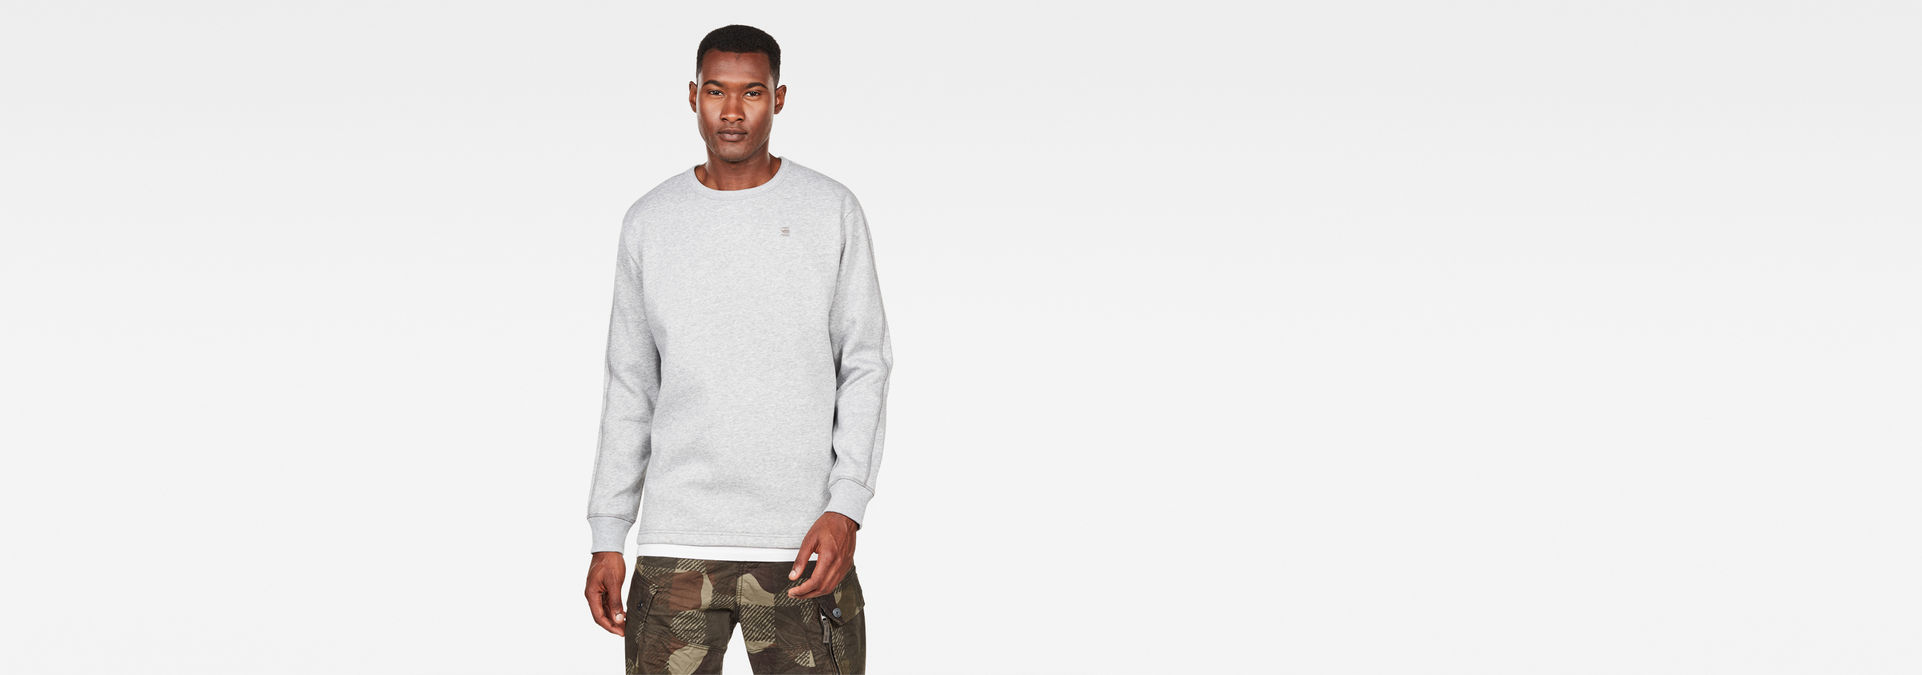 G Star Korpaz Sweater Beige | Mens sweatshirts